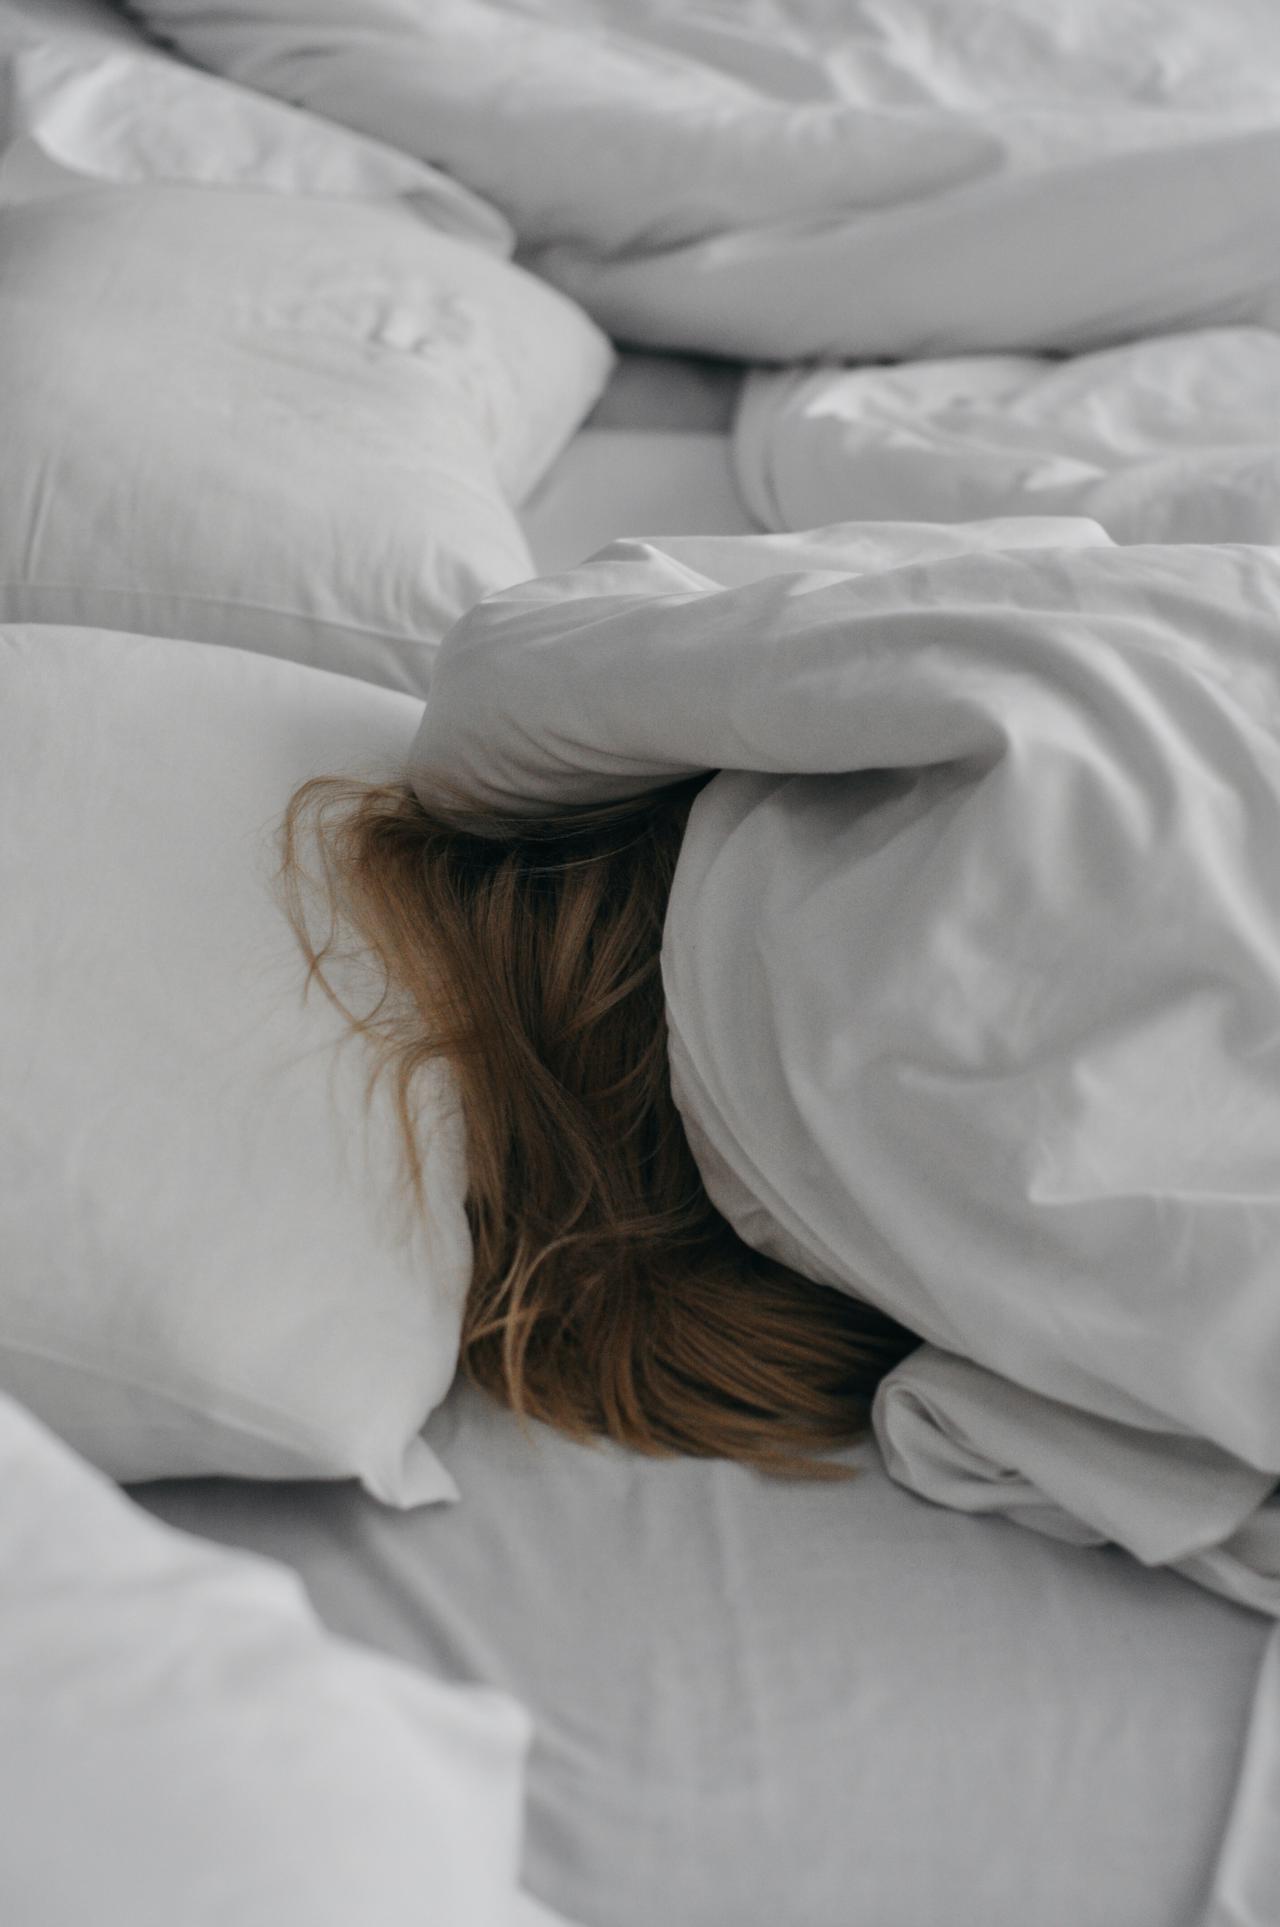 Sleeper who wishes she had a split head bed base.